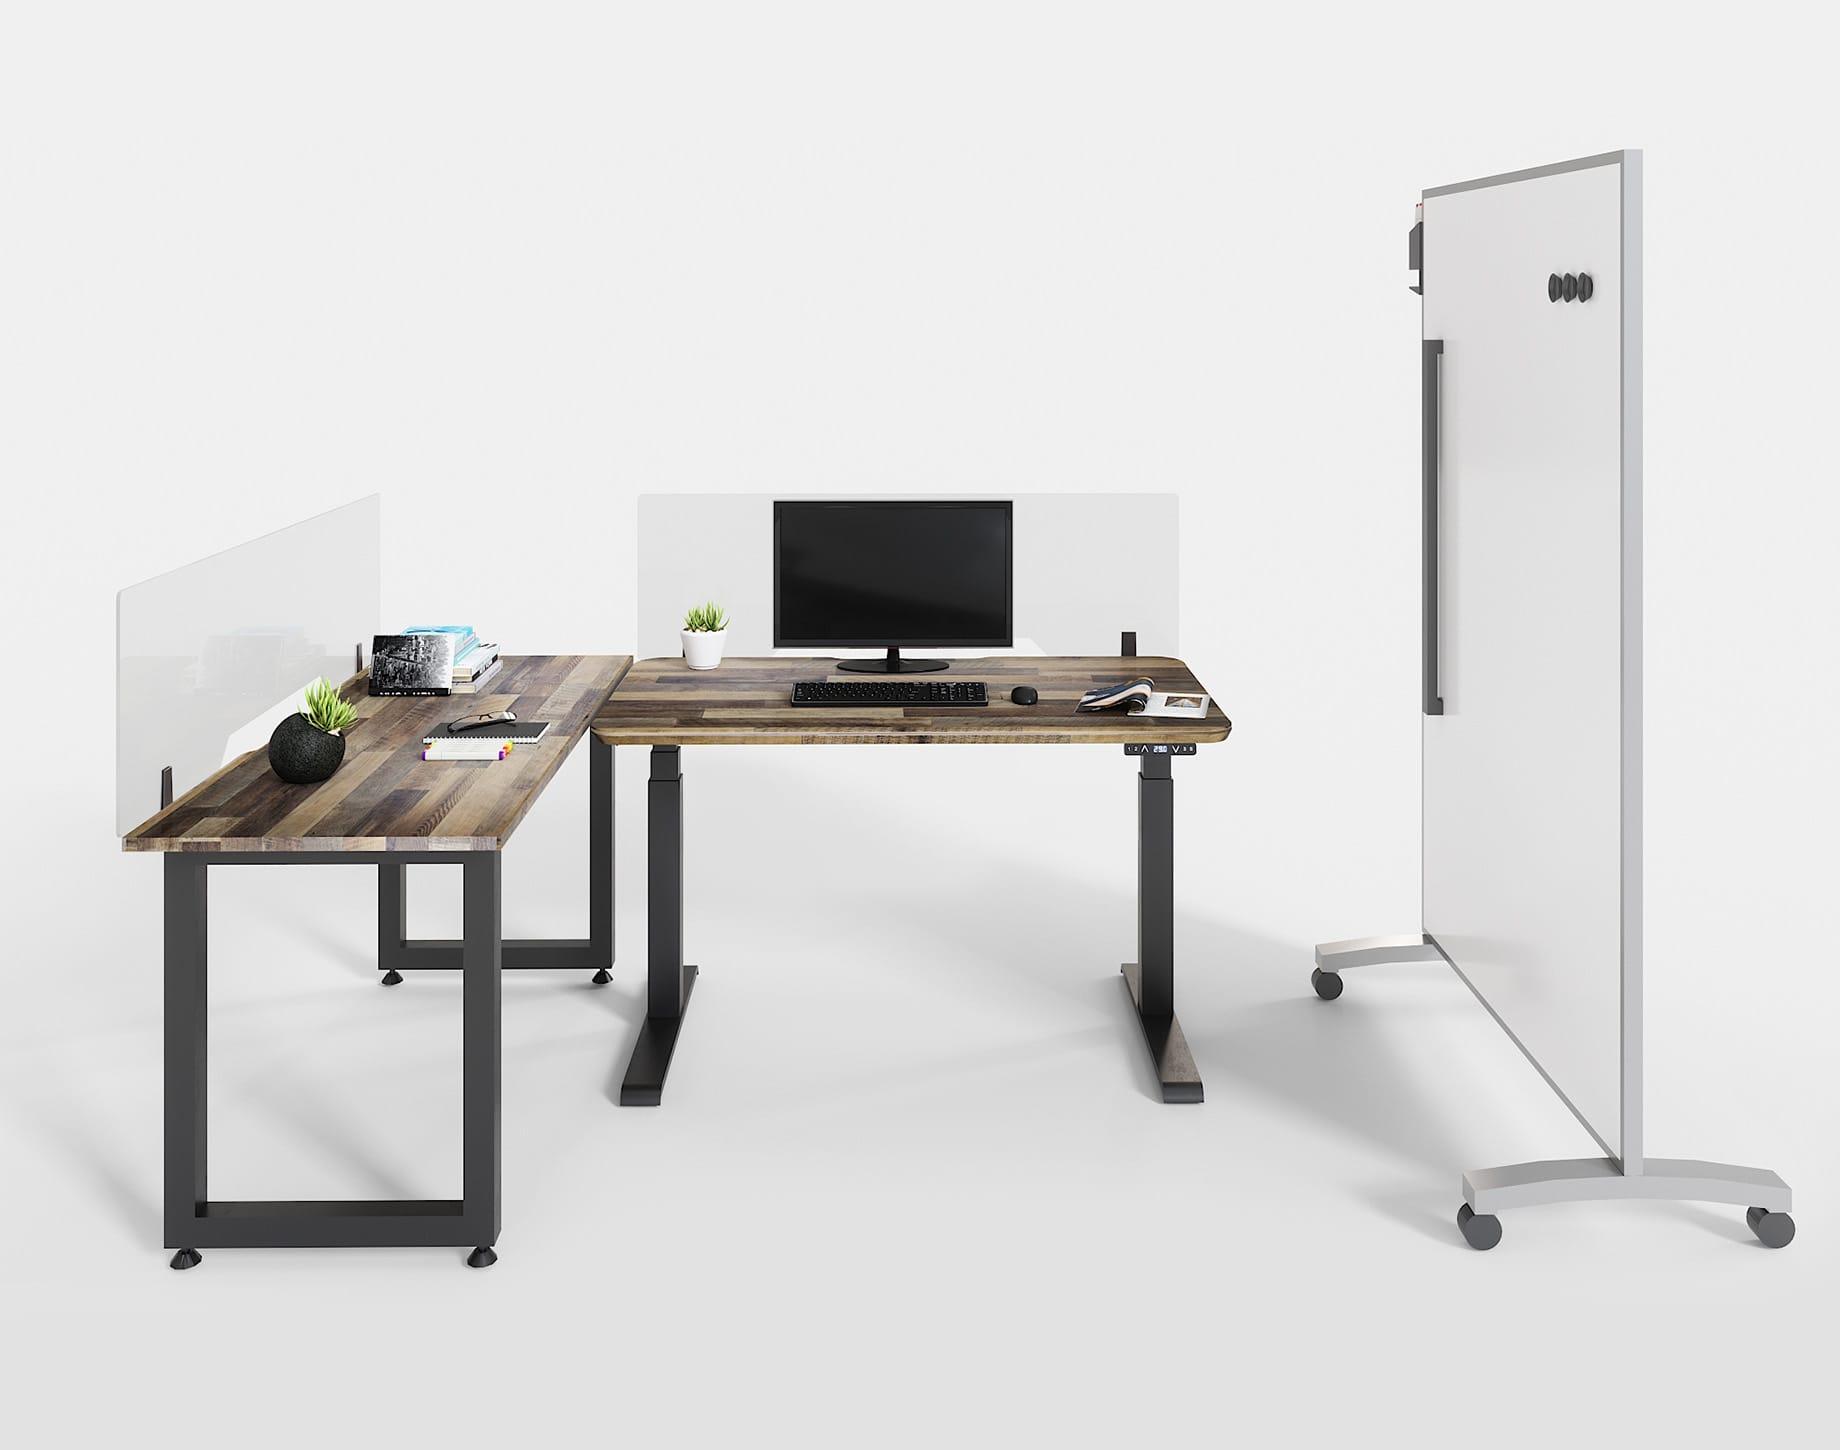 open office space with desktop converters